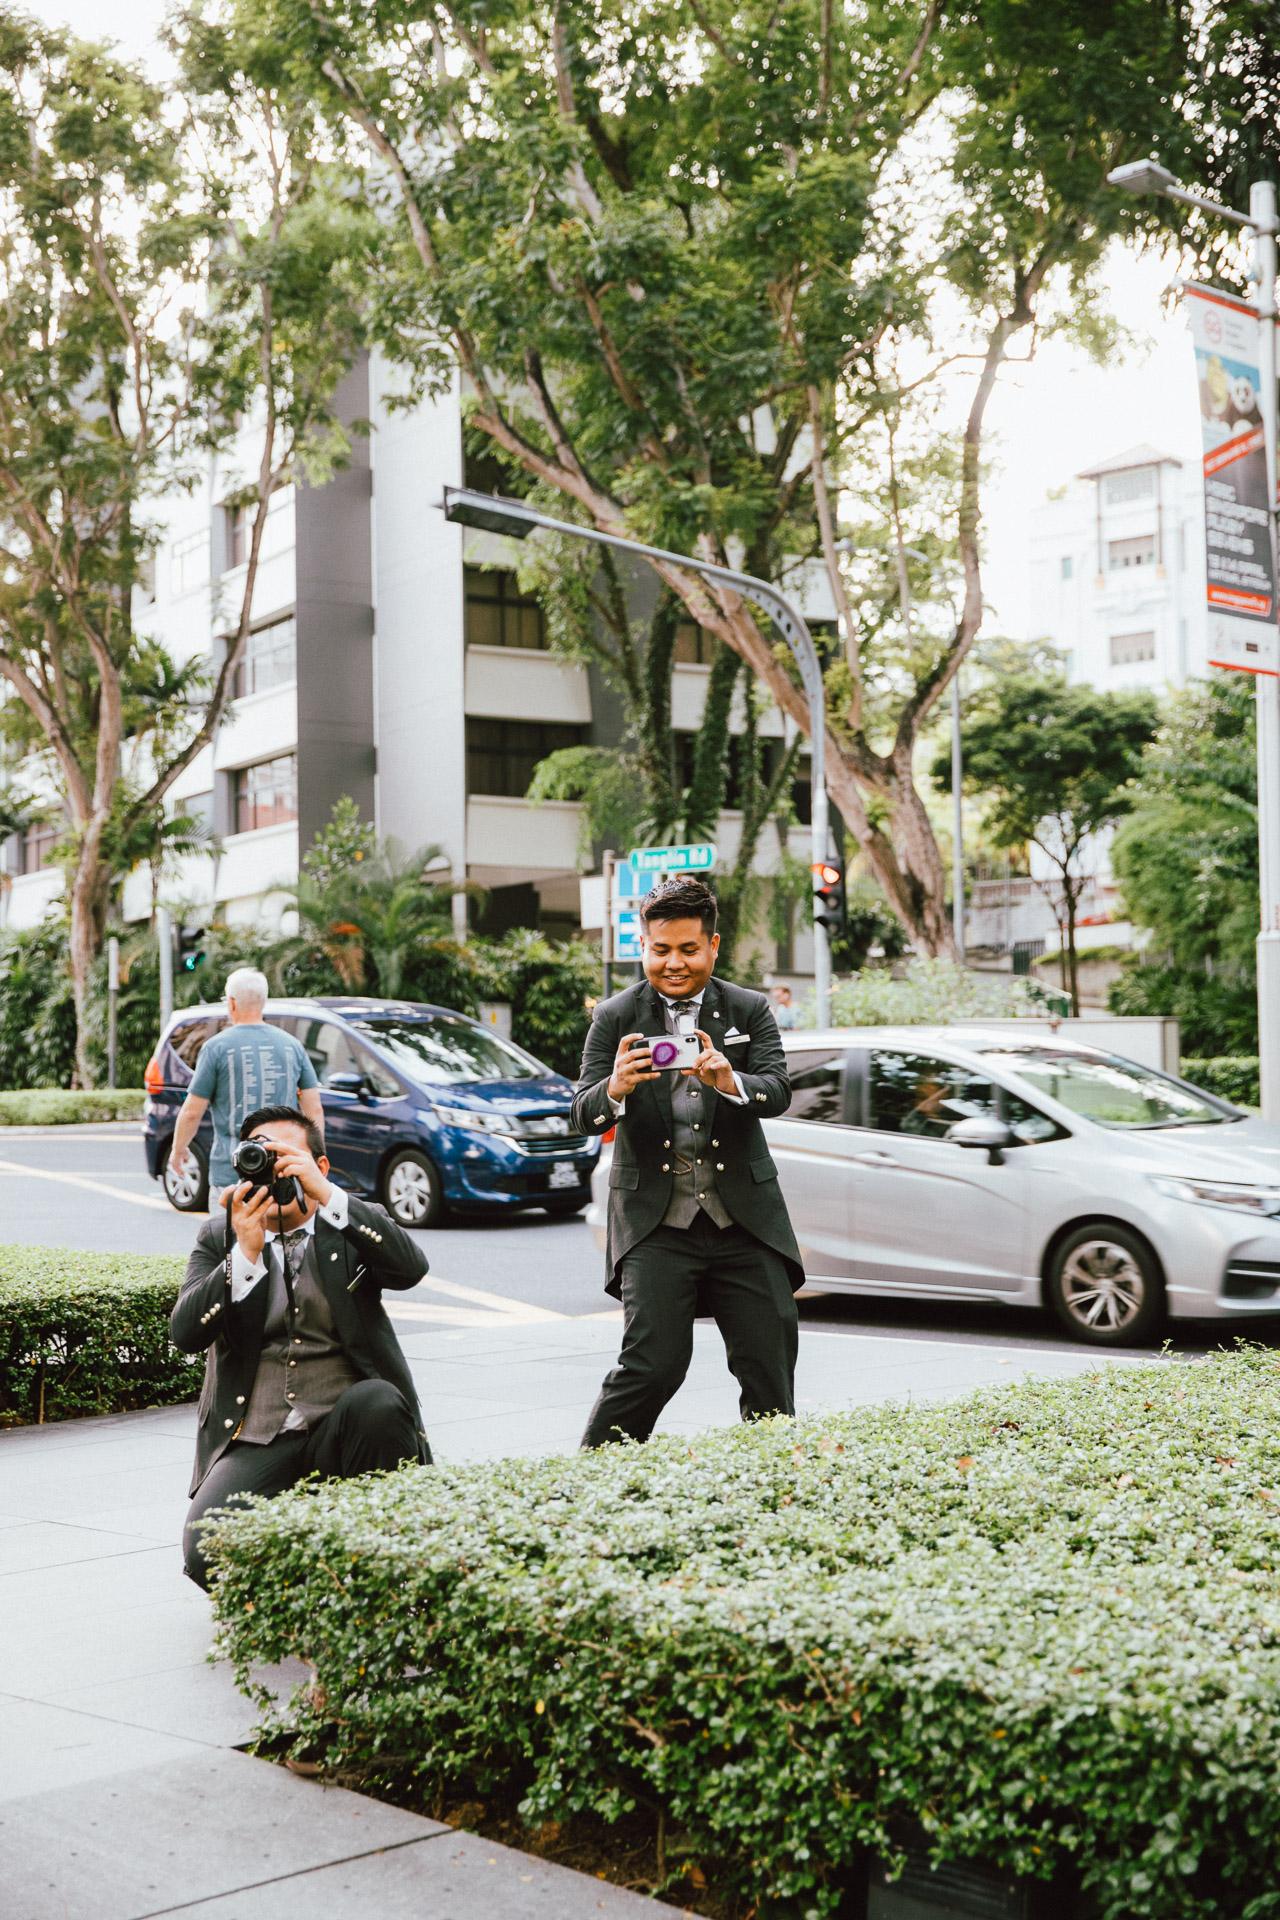 aviation-photographer-lifestyle-china-eastern-singapore-destination-1646.jpg